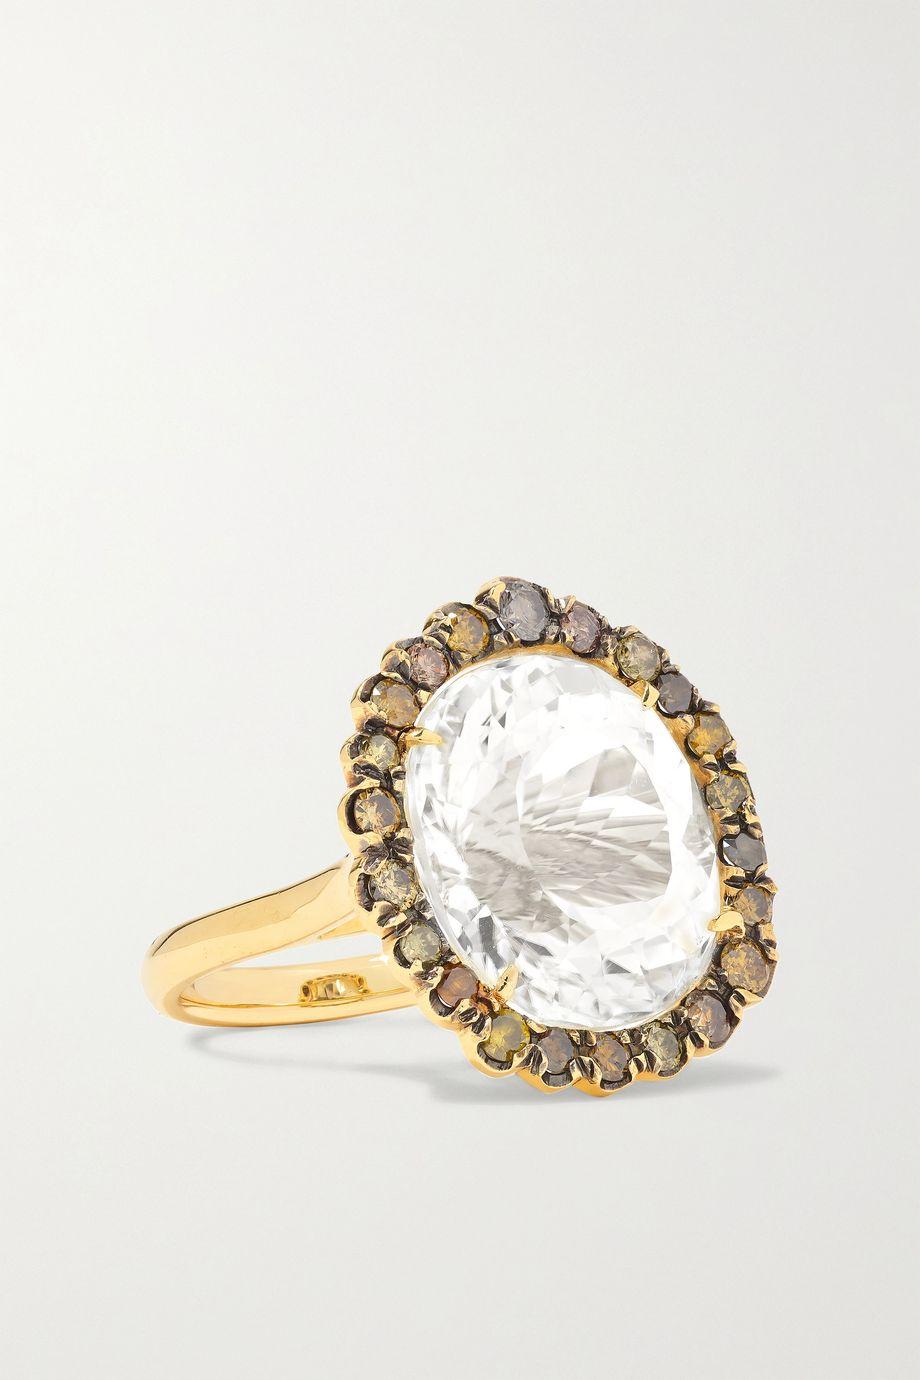 Kimberly McDonald 18-karat gold, spodumene and diamond ring